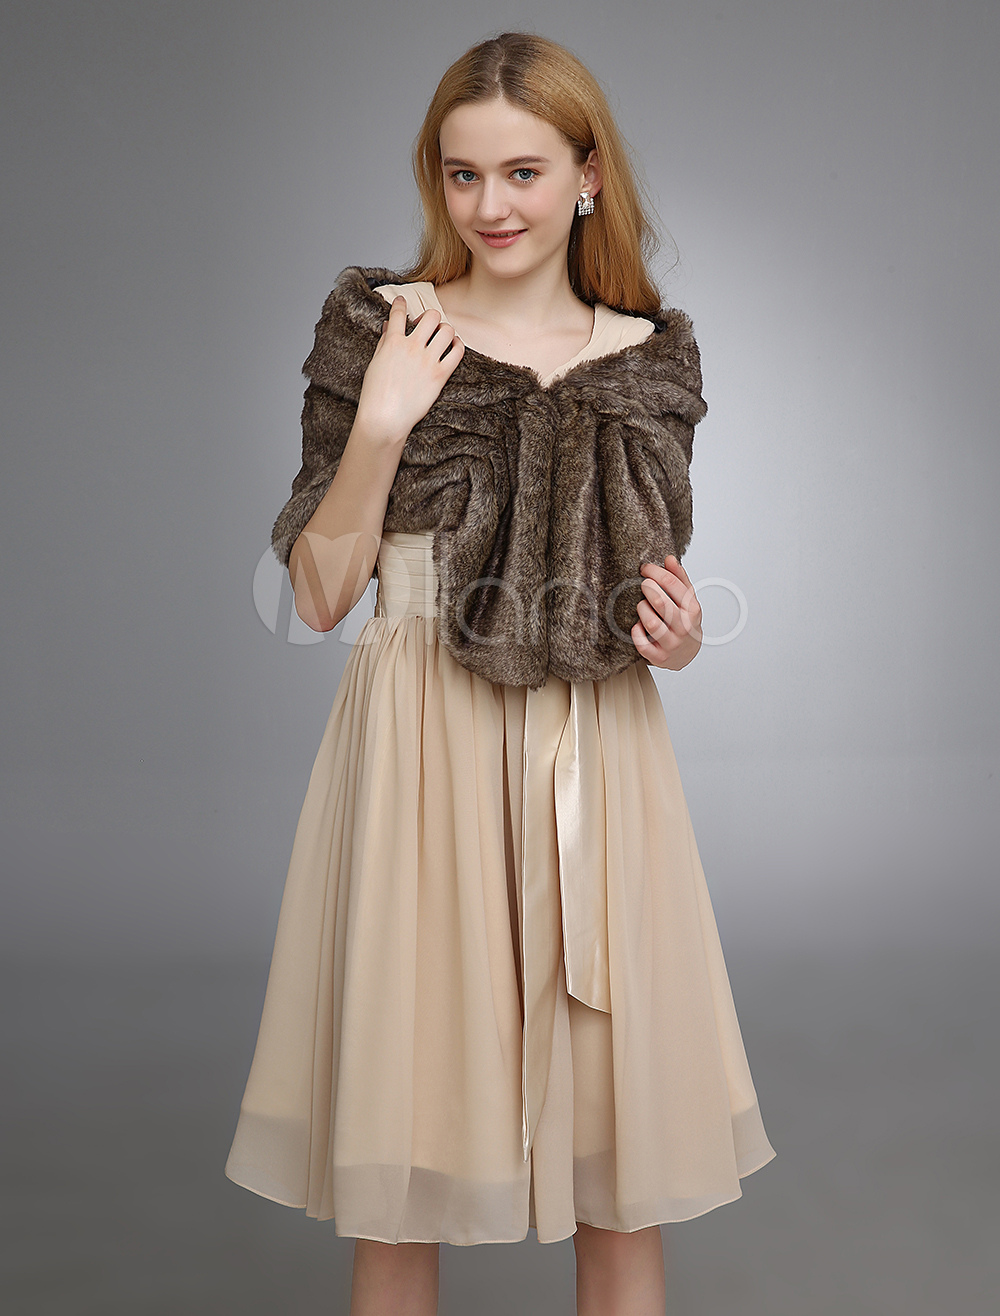 Deep Brown Wedding Shawl With Faux Fur $29.99 AT vintagedancer.com